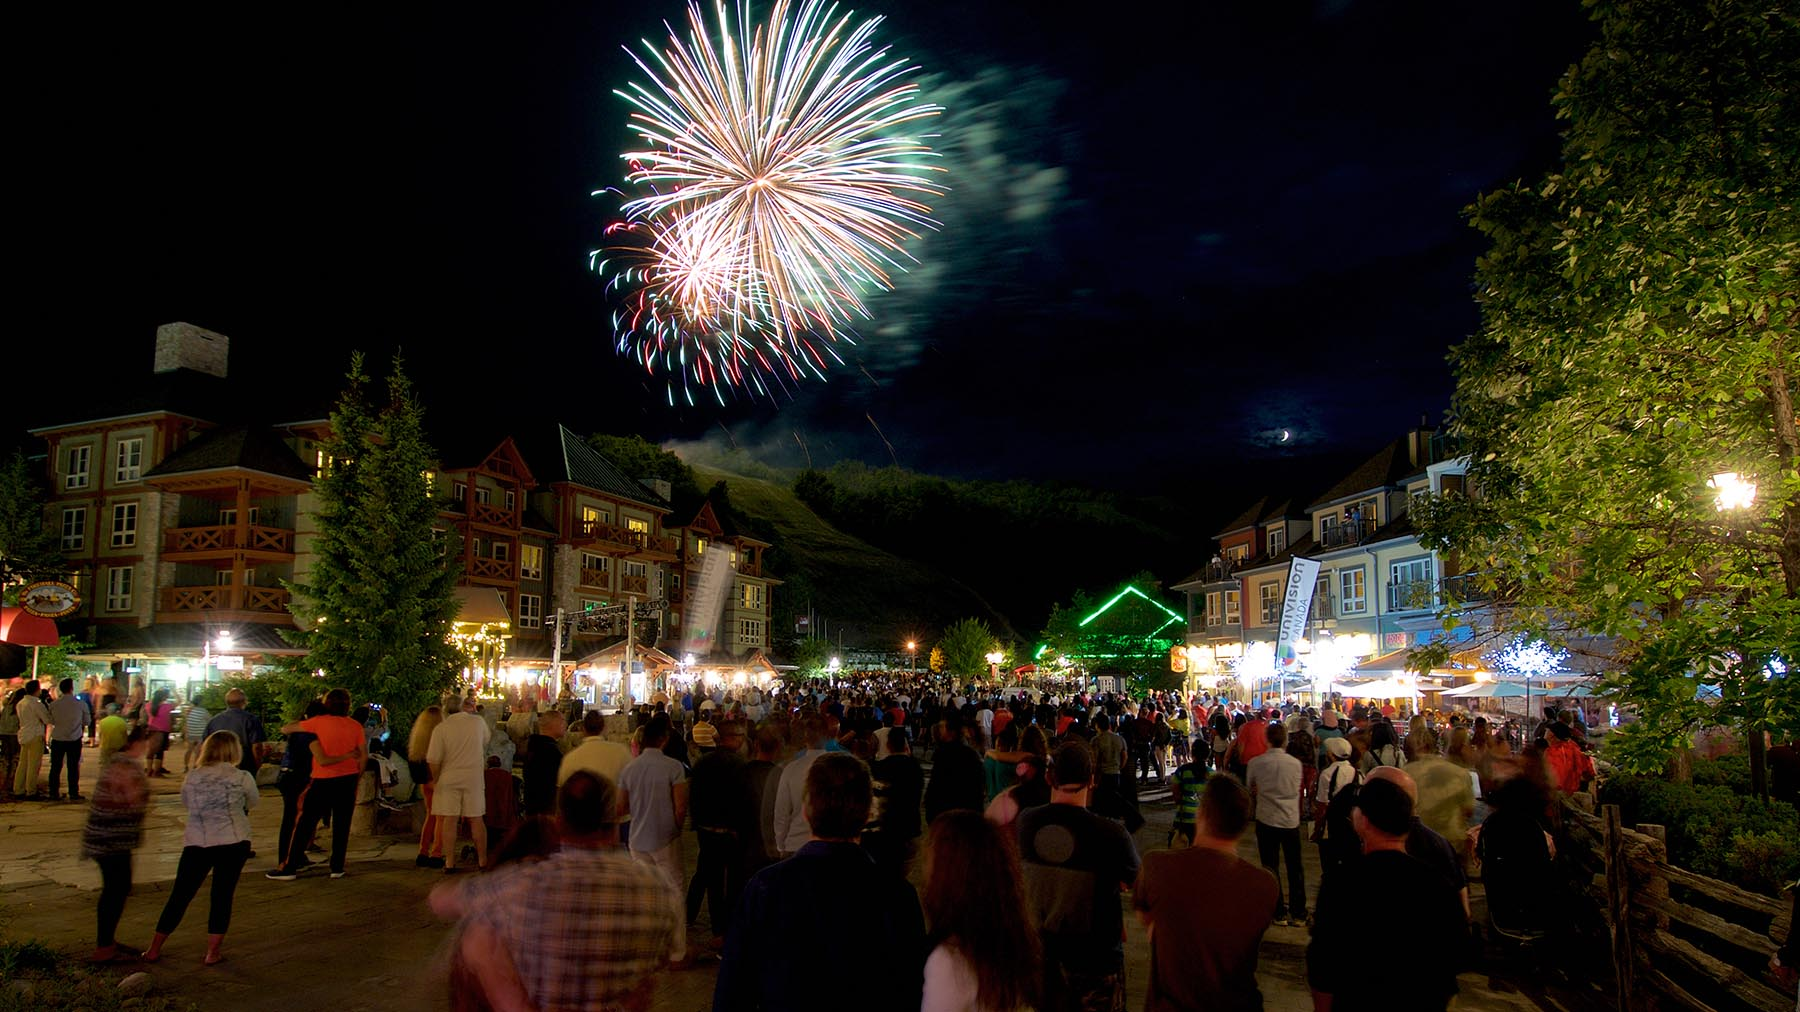 thumbail_desktop_fireworks_village-ashx